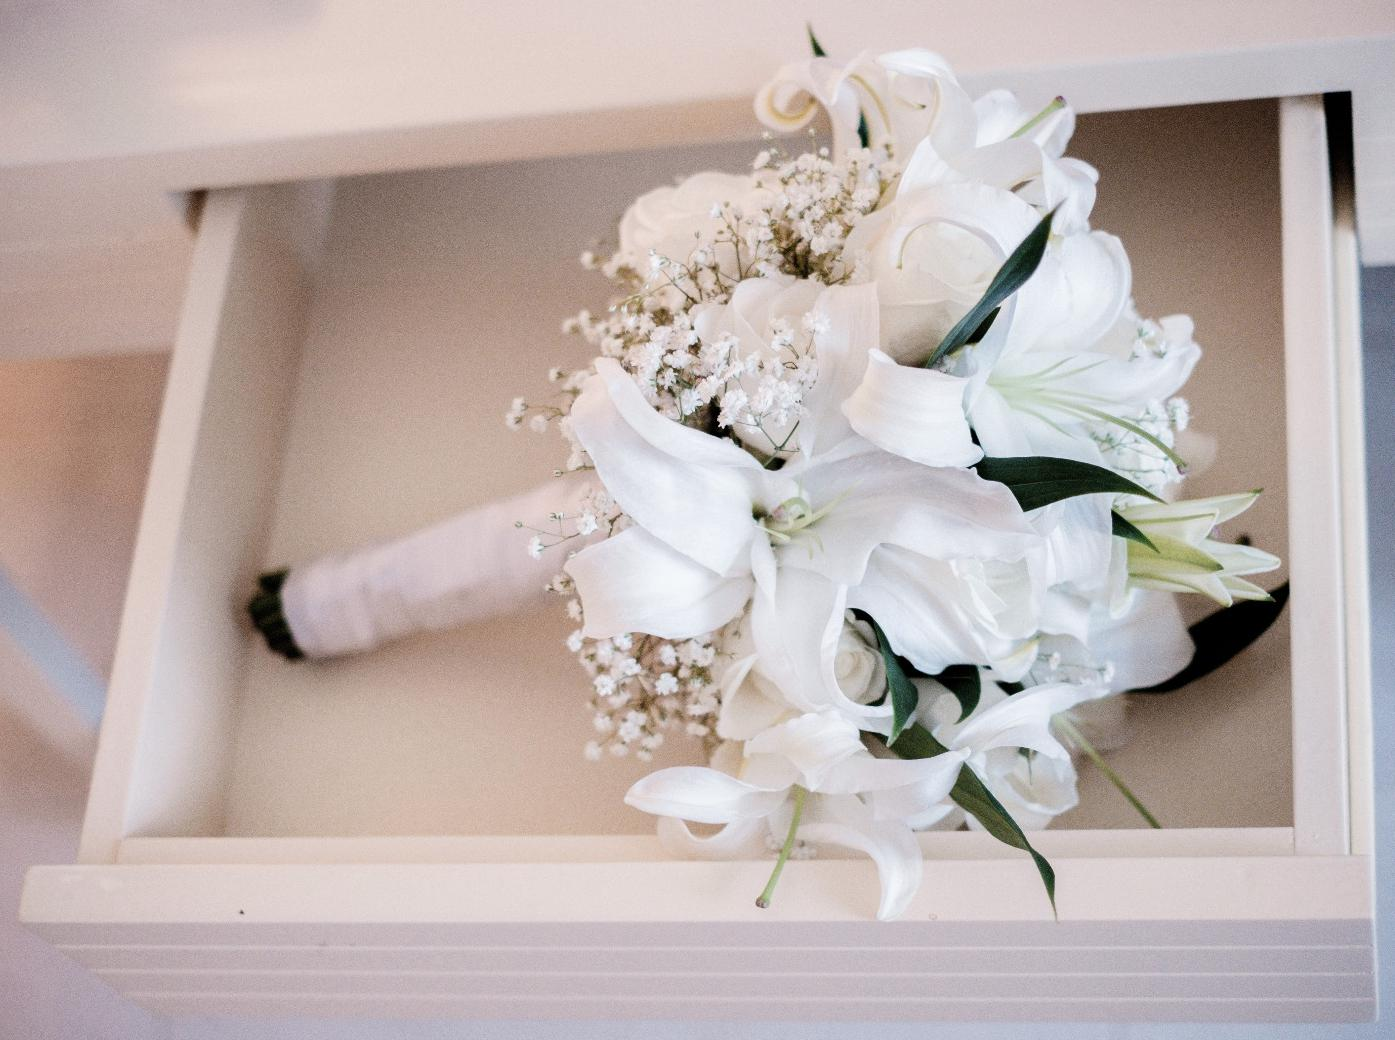 bodas-sin-clasificar-sin-tema-cuba-25451.jpg